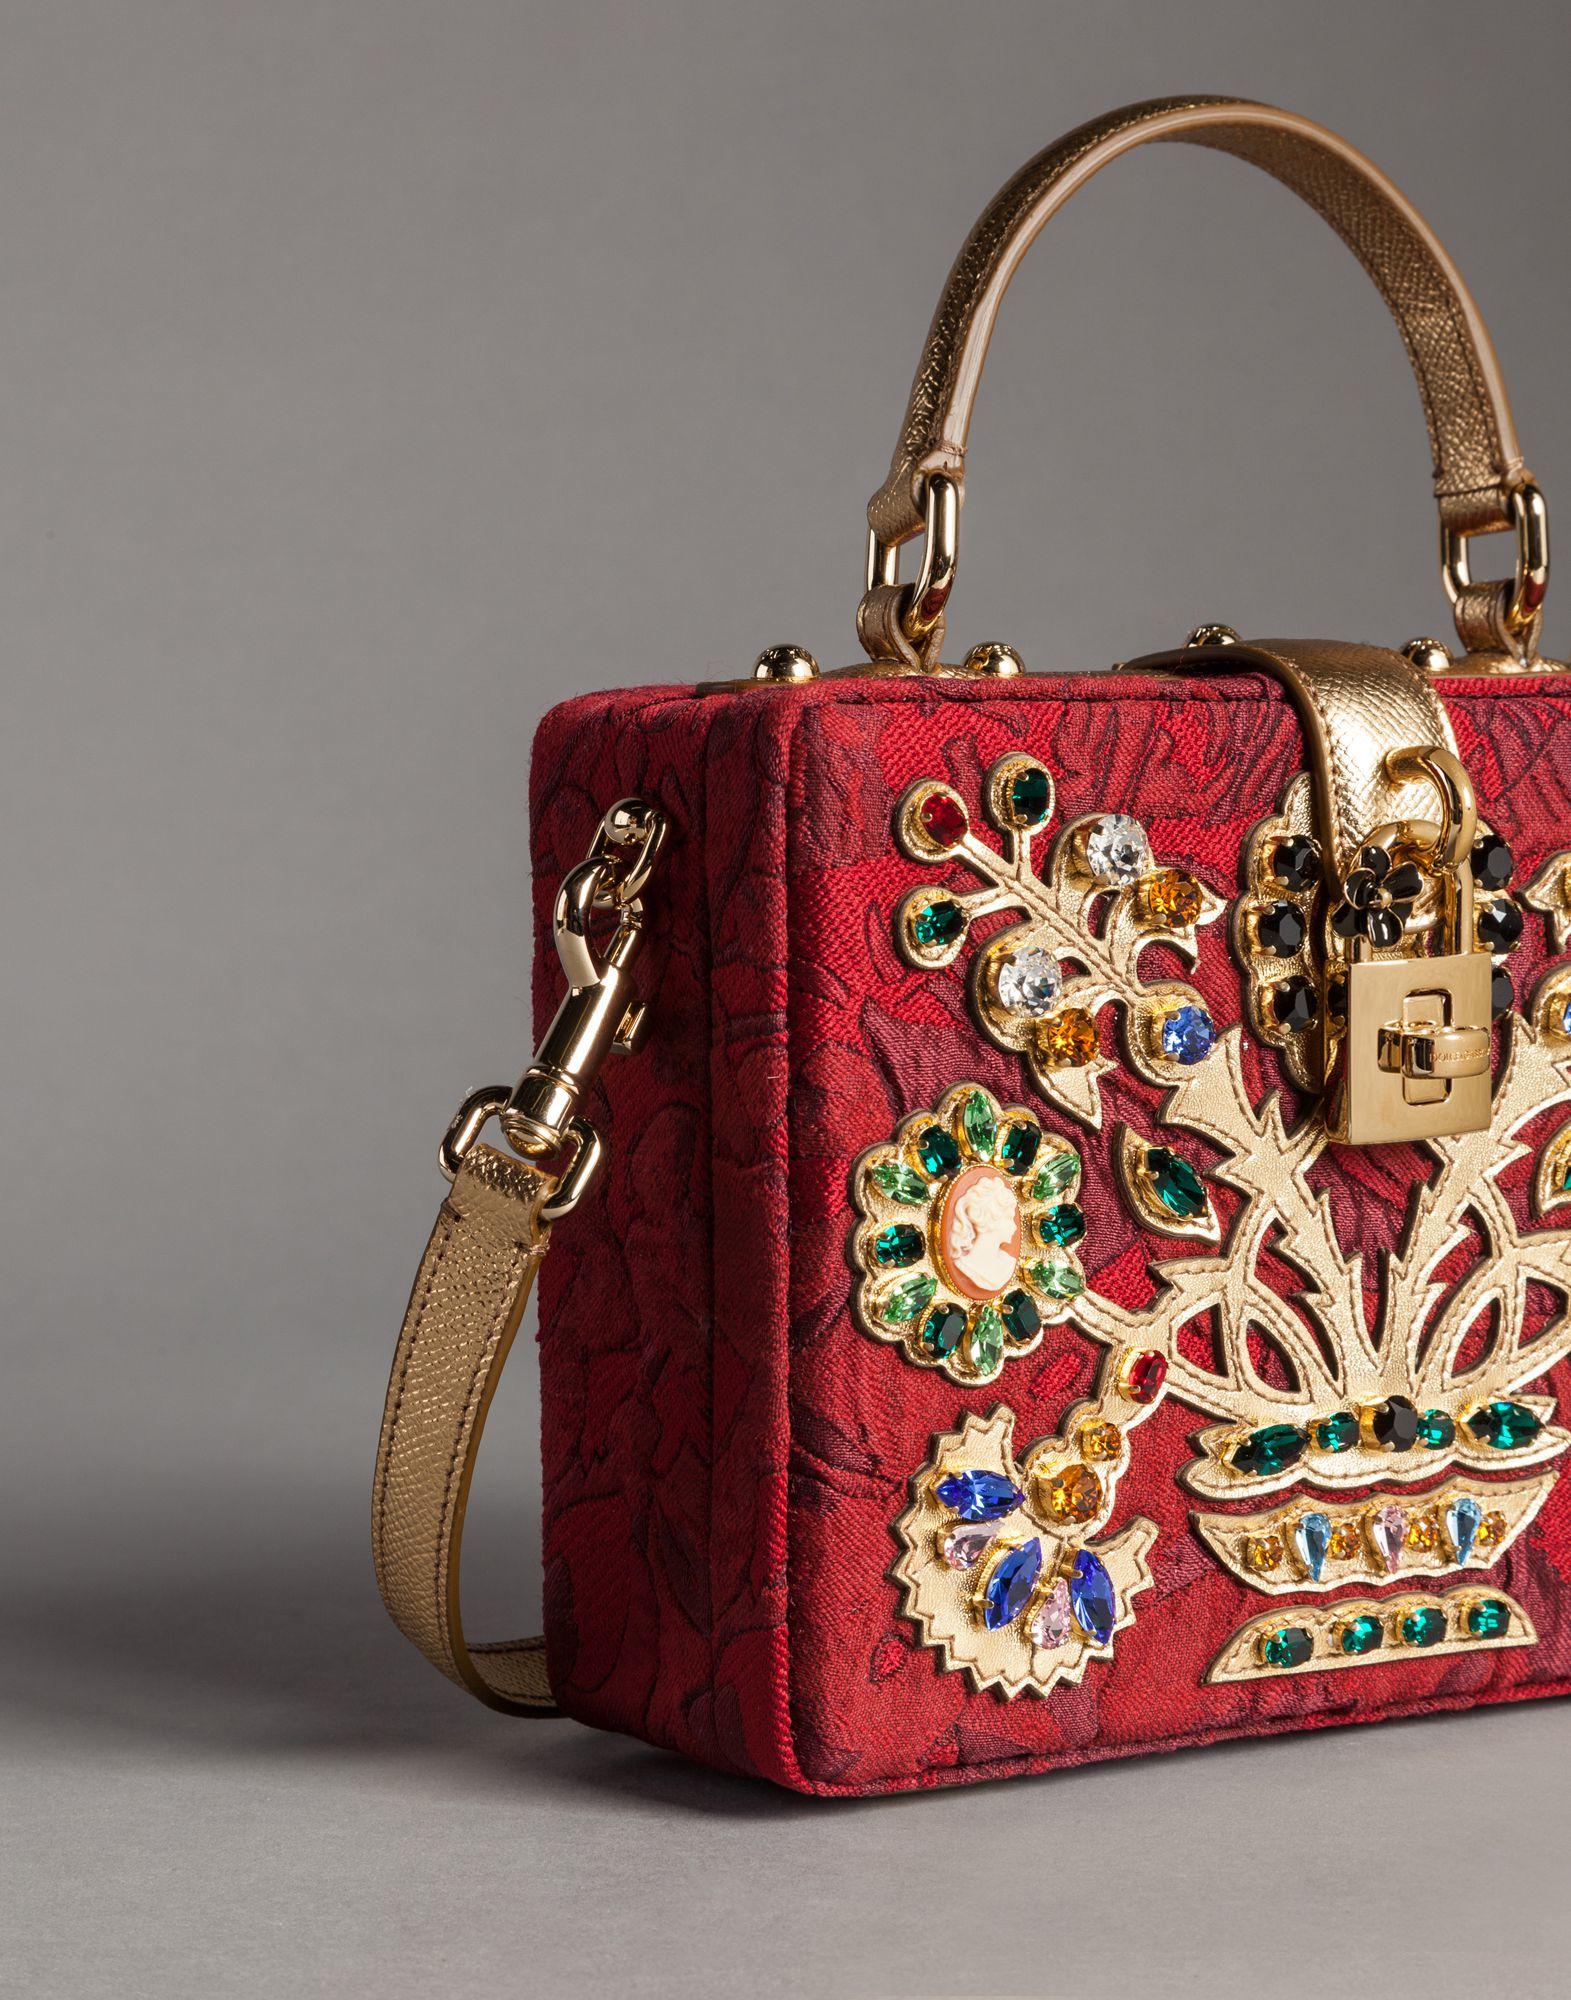 1f4caba31292 Dolce And Gabbana Purses Canada - Best Purse Image Ccdbb.Org